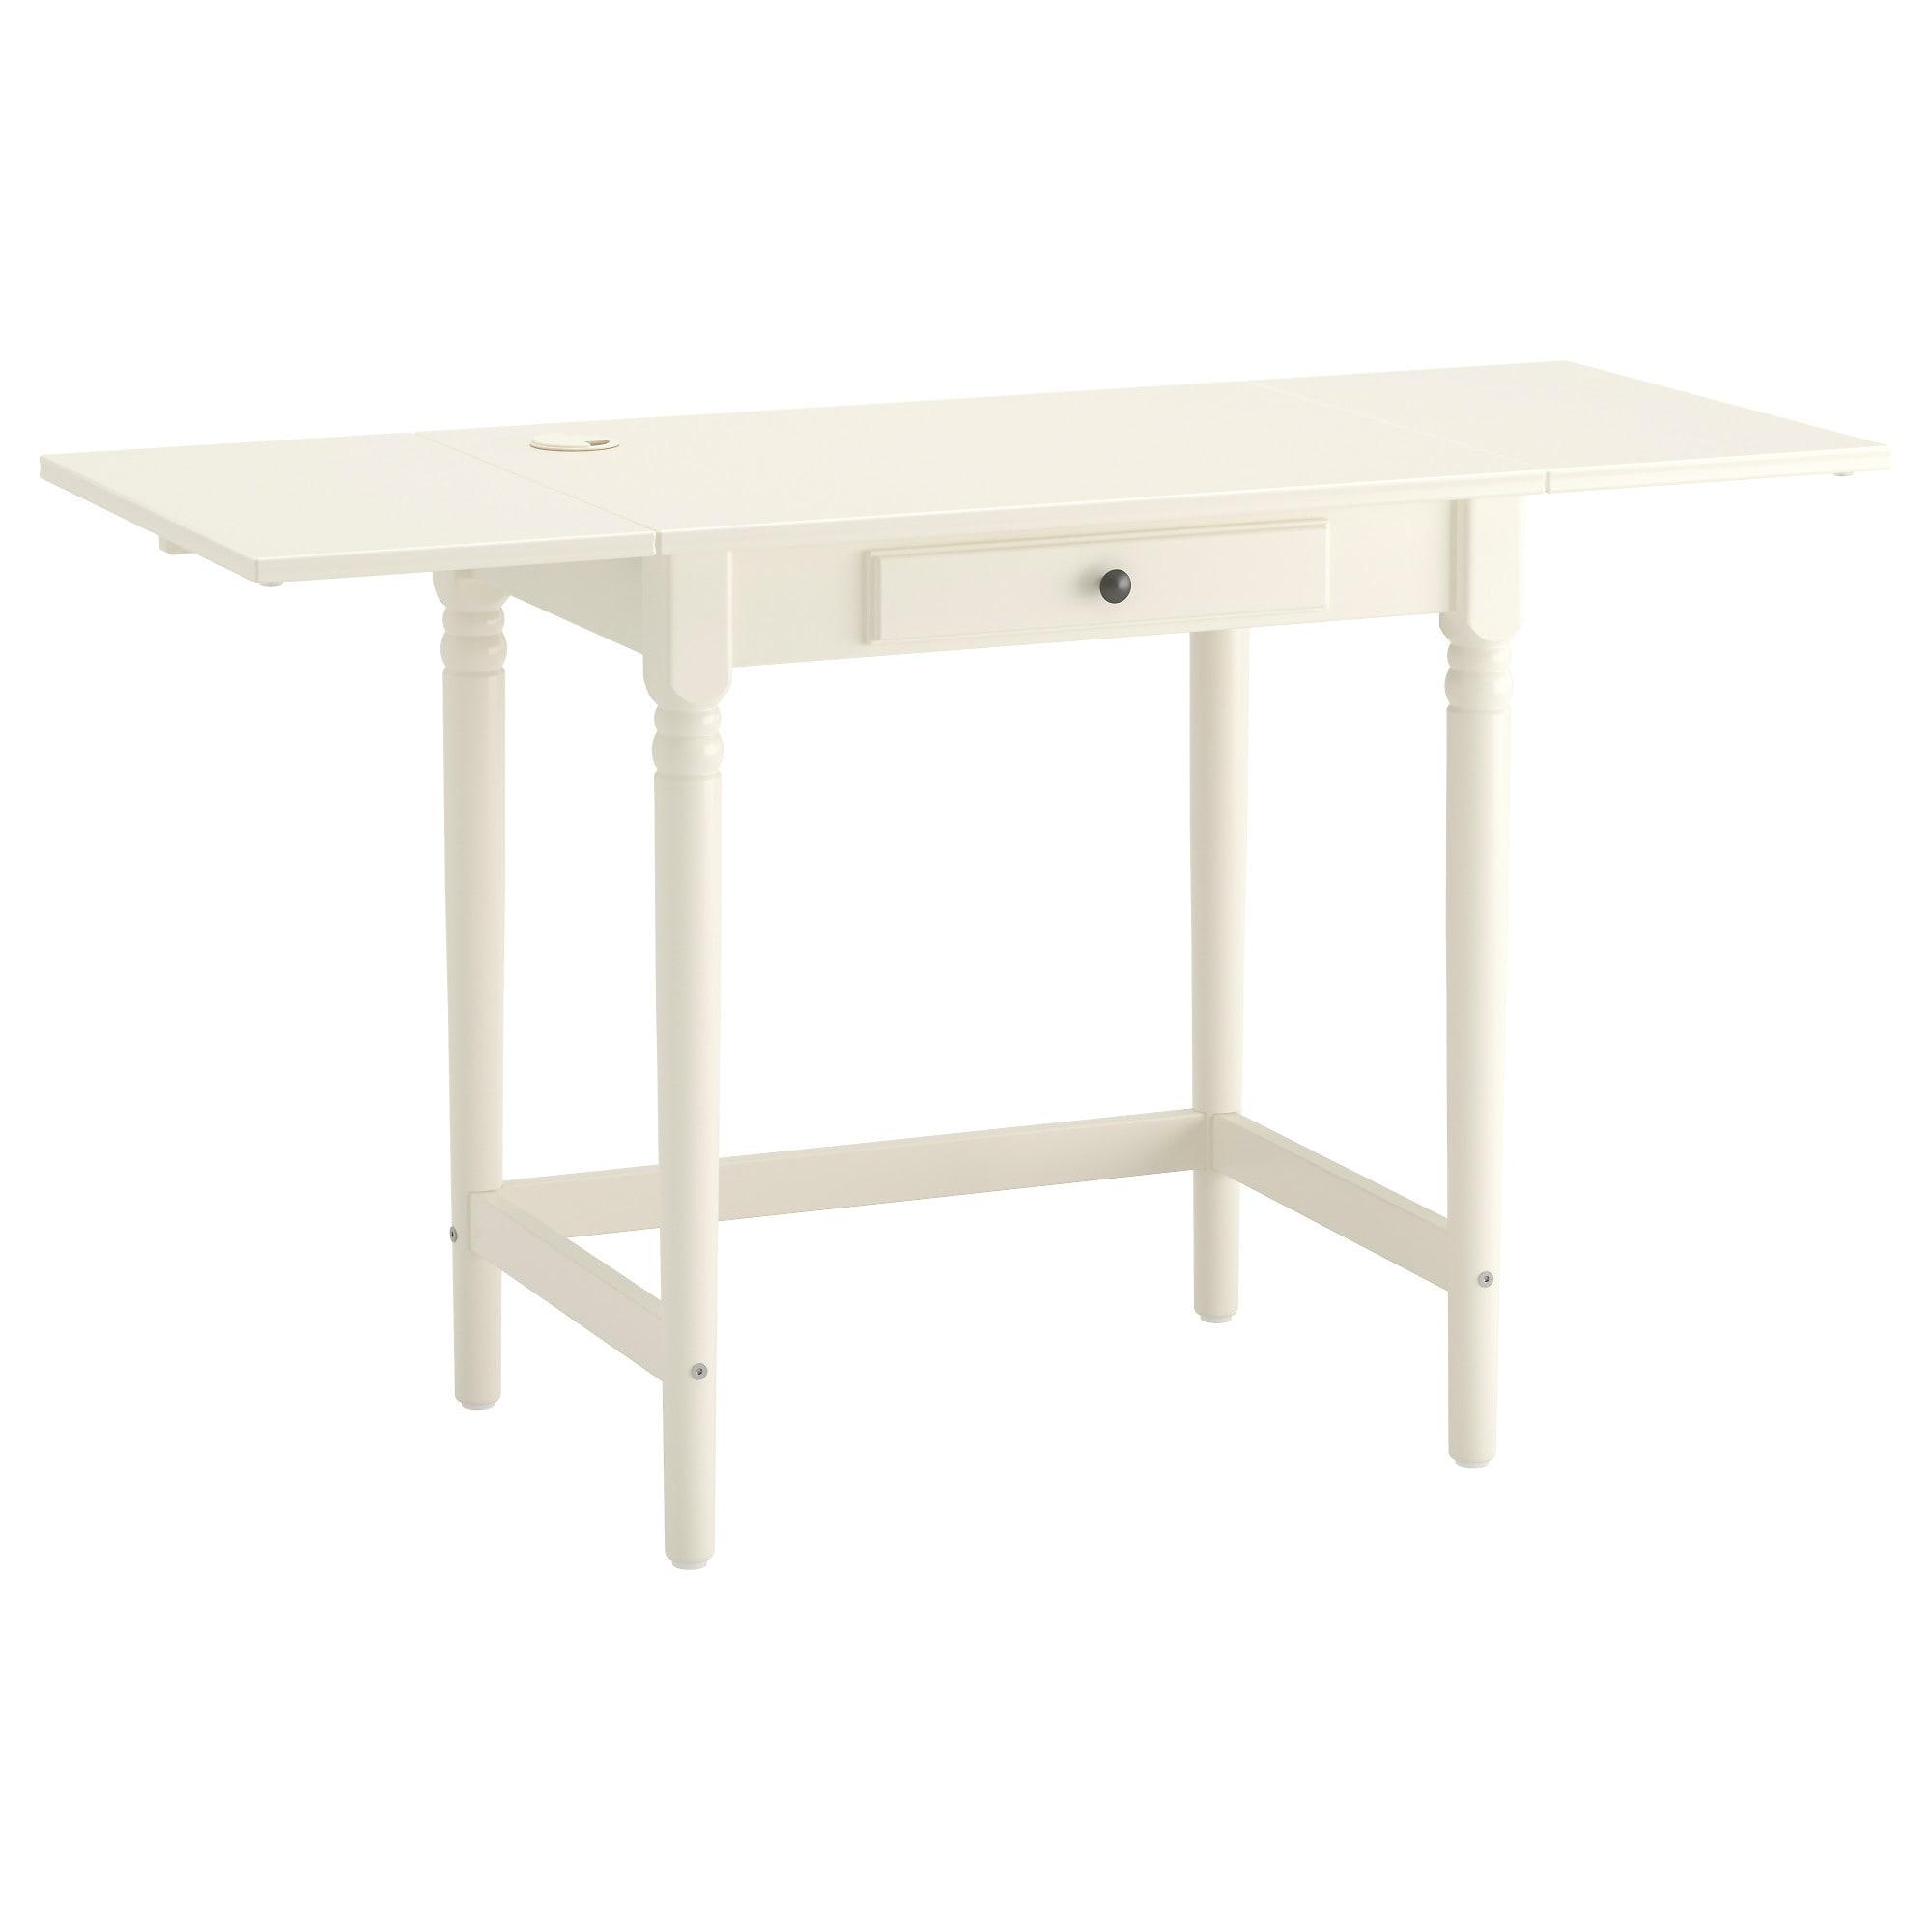 Ikea Mesas Escritorio Zwdg Ingatorp Escritorio Blanco 73 X 50 Cm Ikea